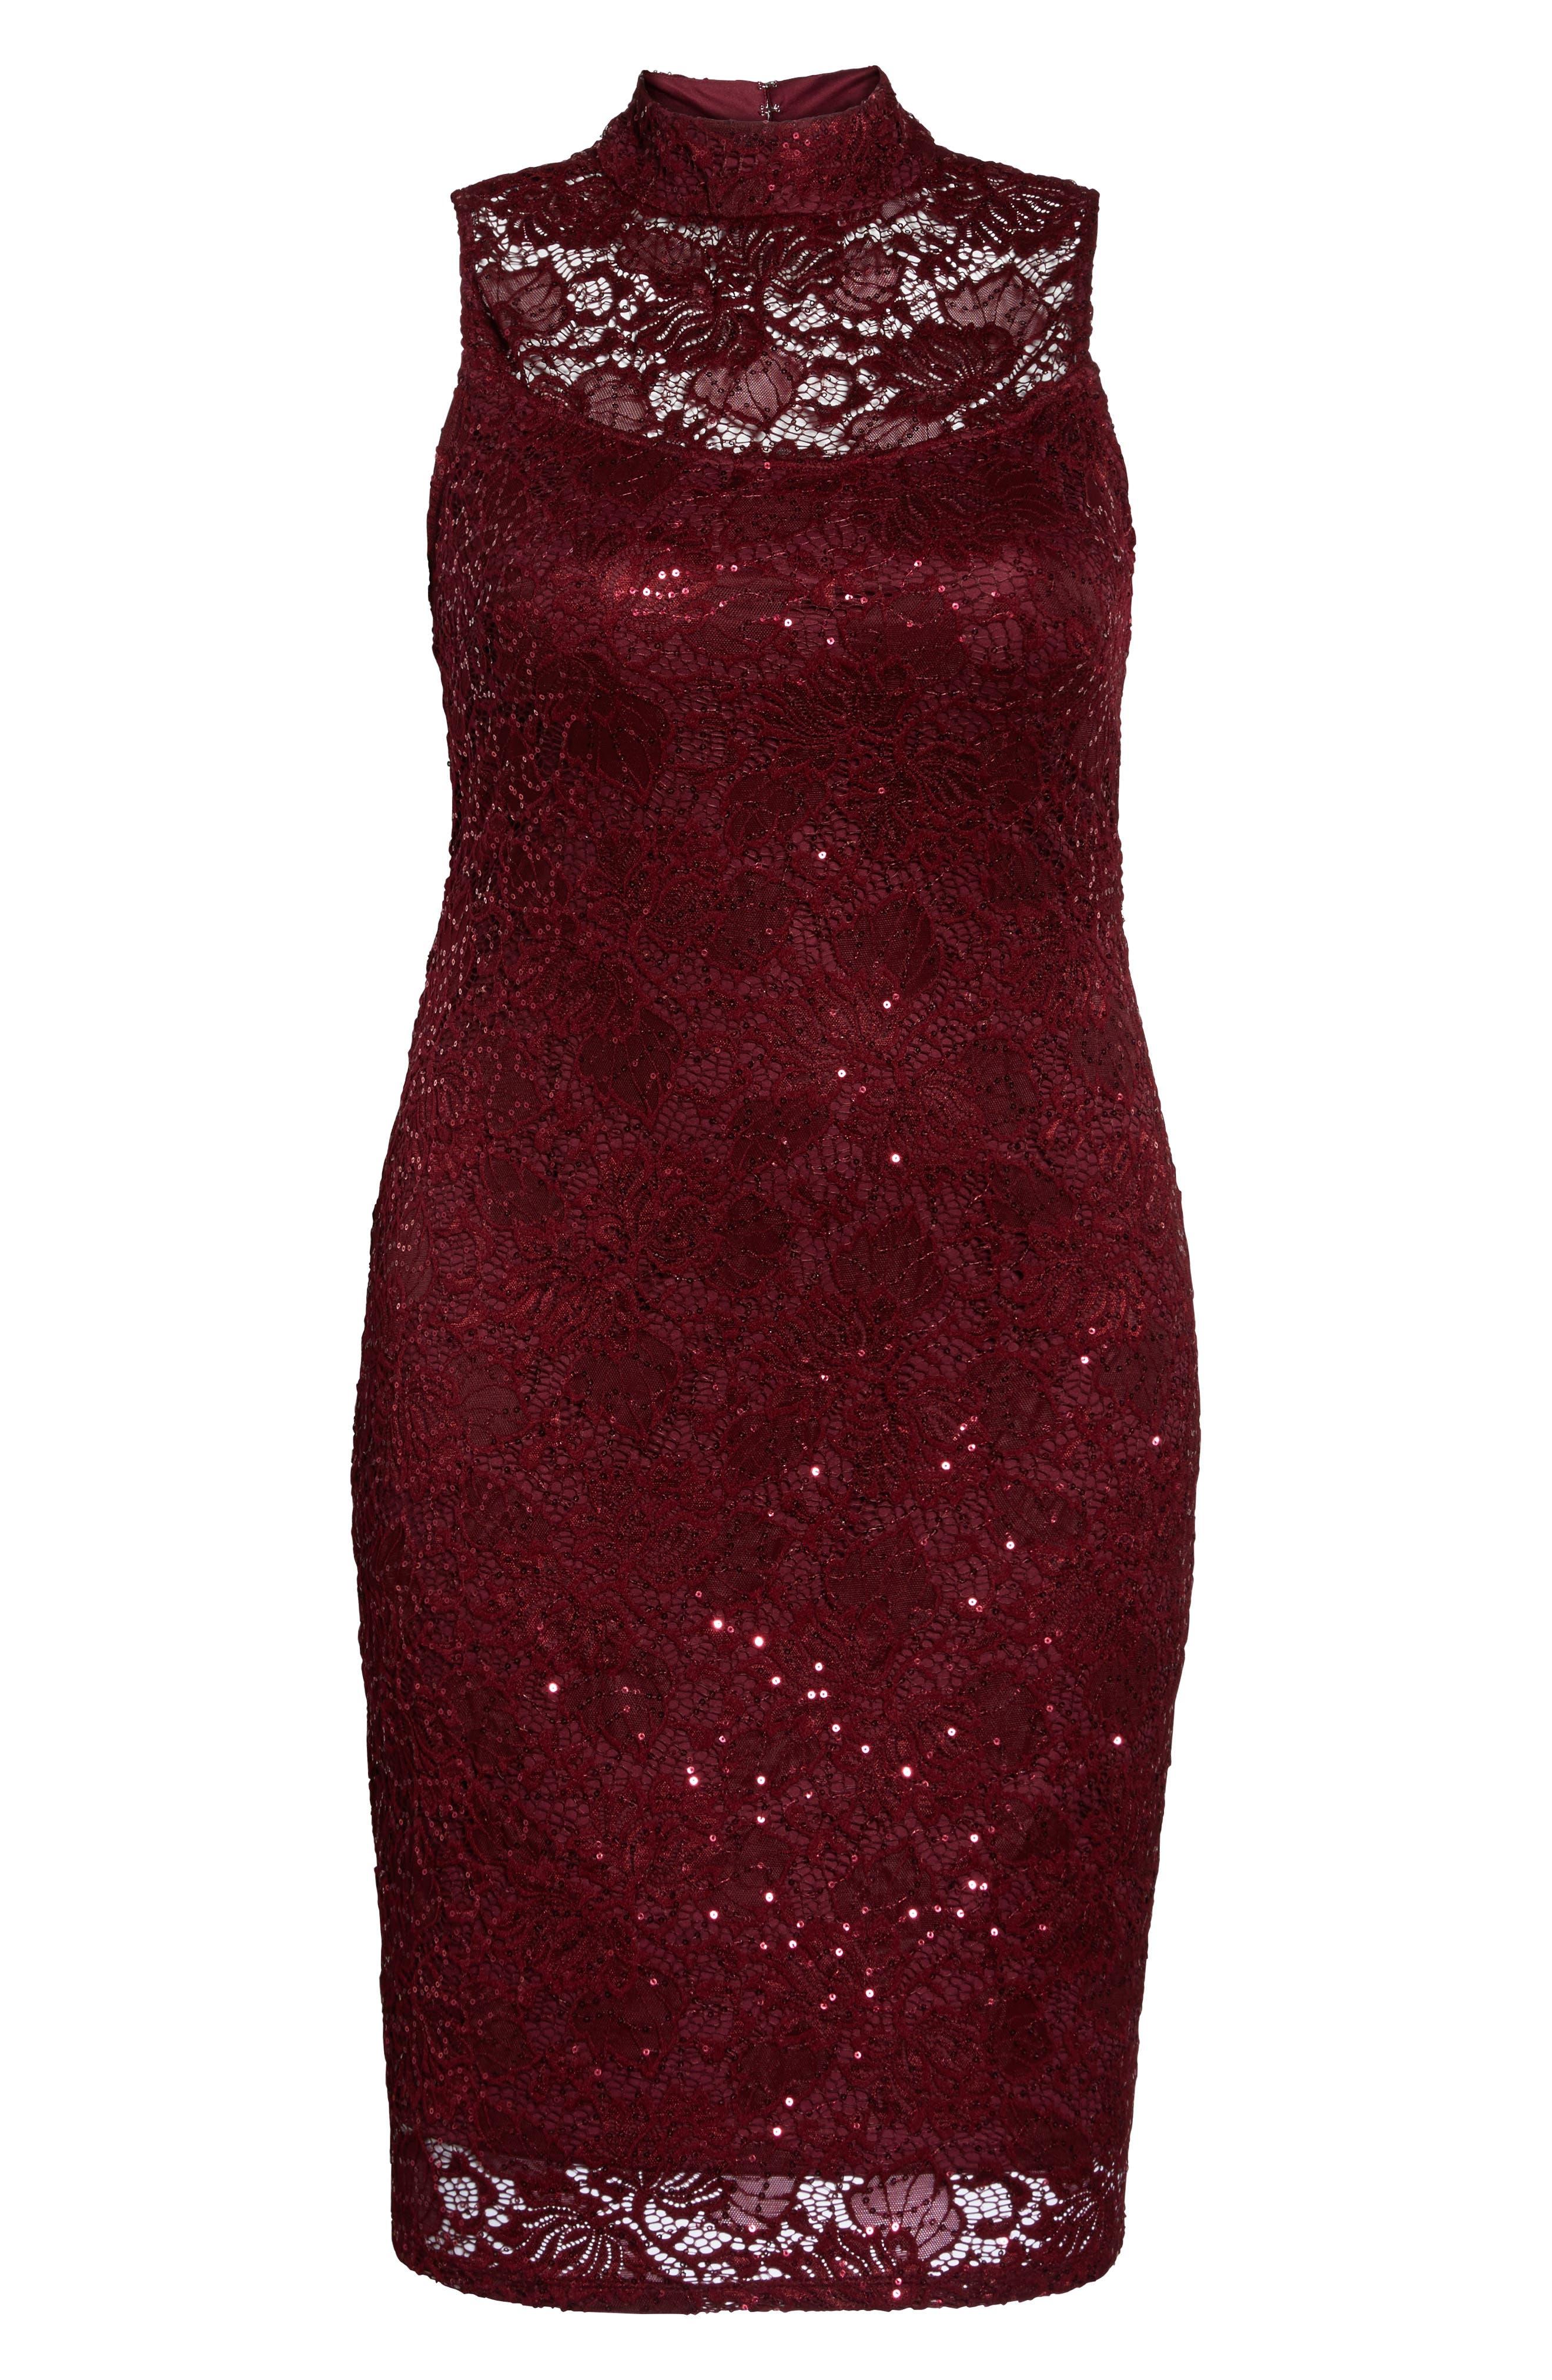 Sequin Lace Sheath Dress,                             Main thumbnail 1, color,                             Burgundy